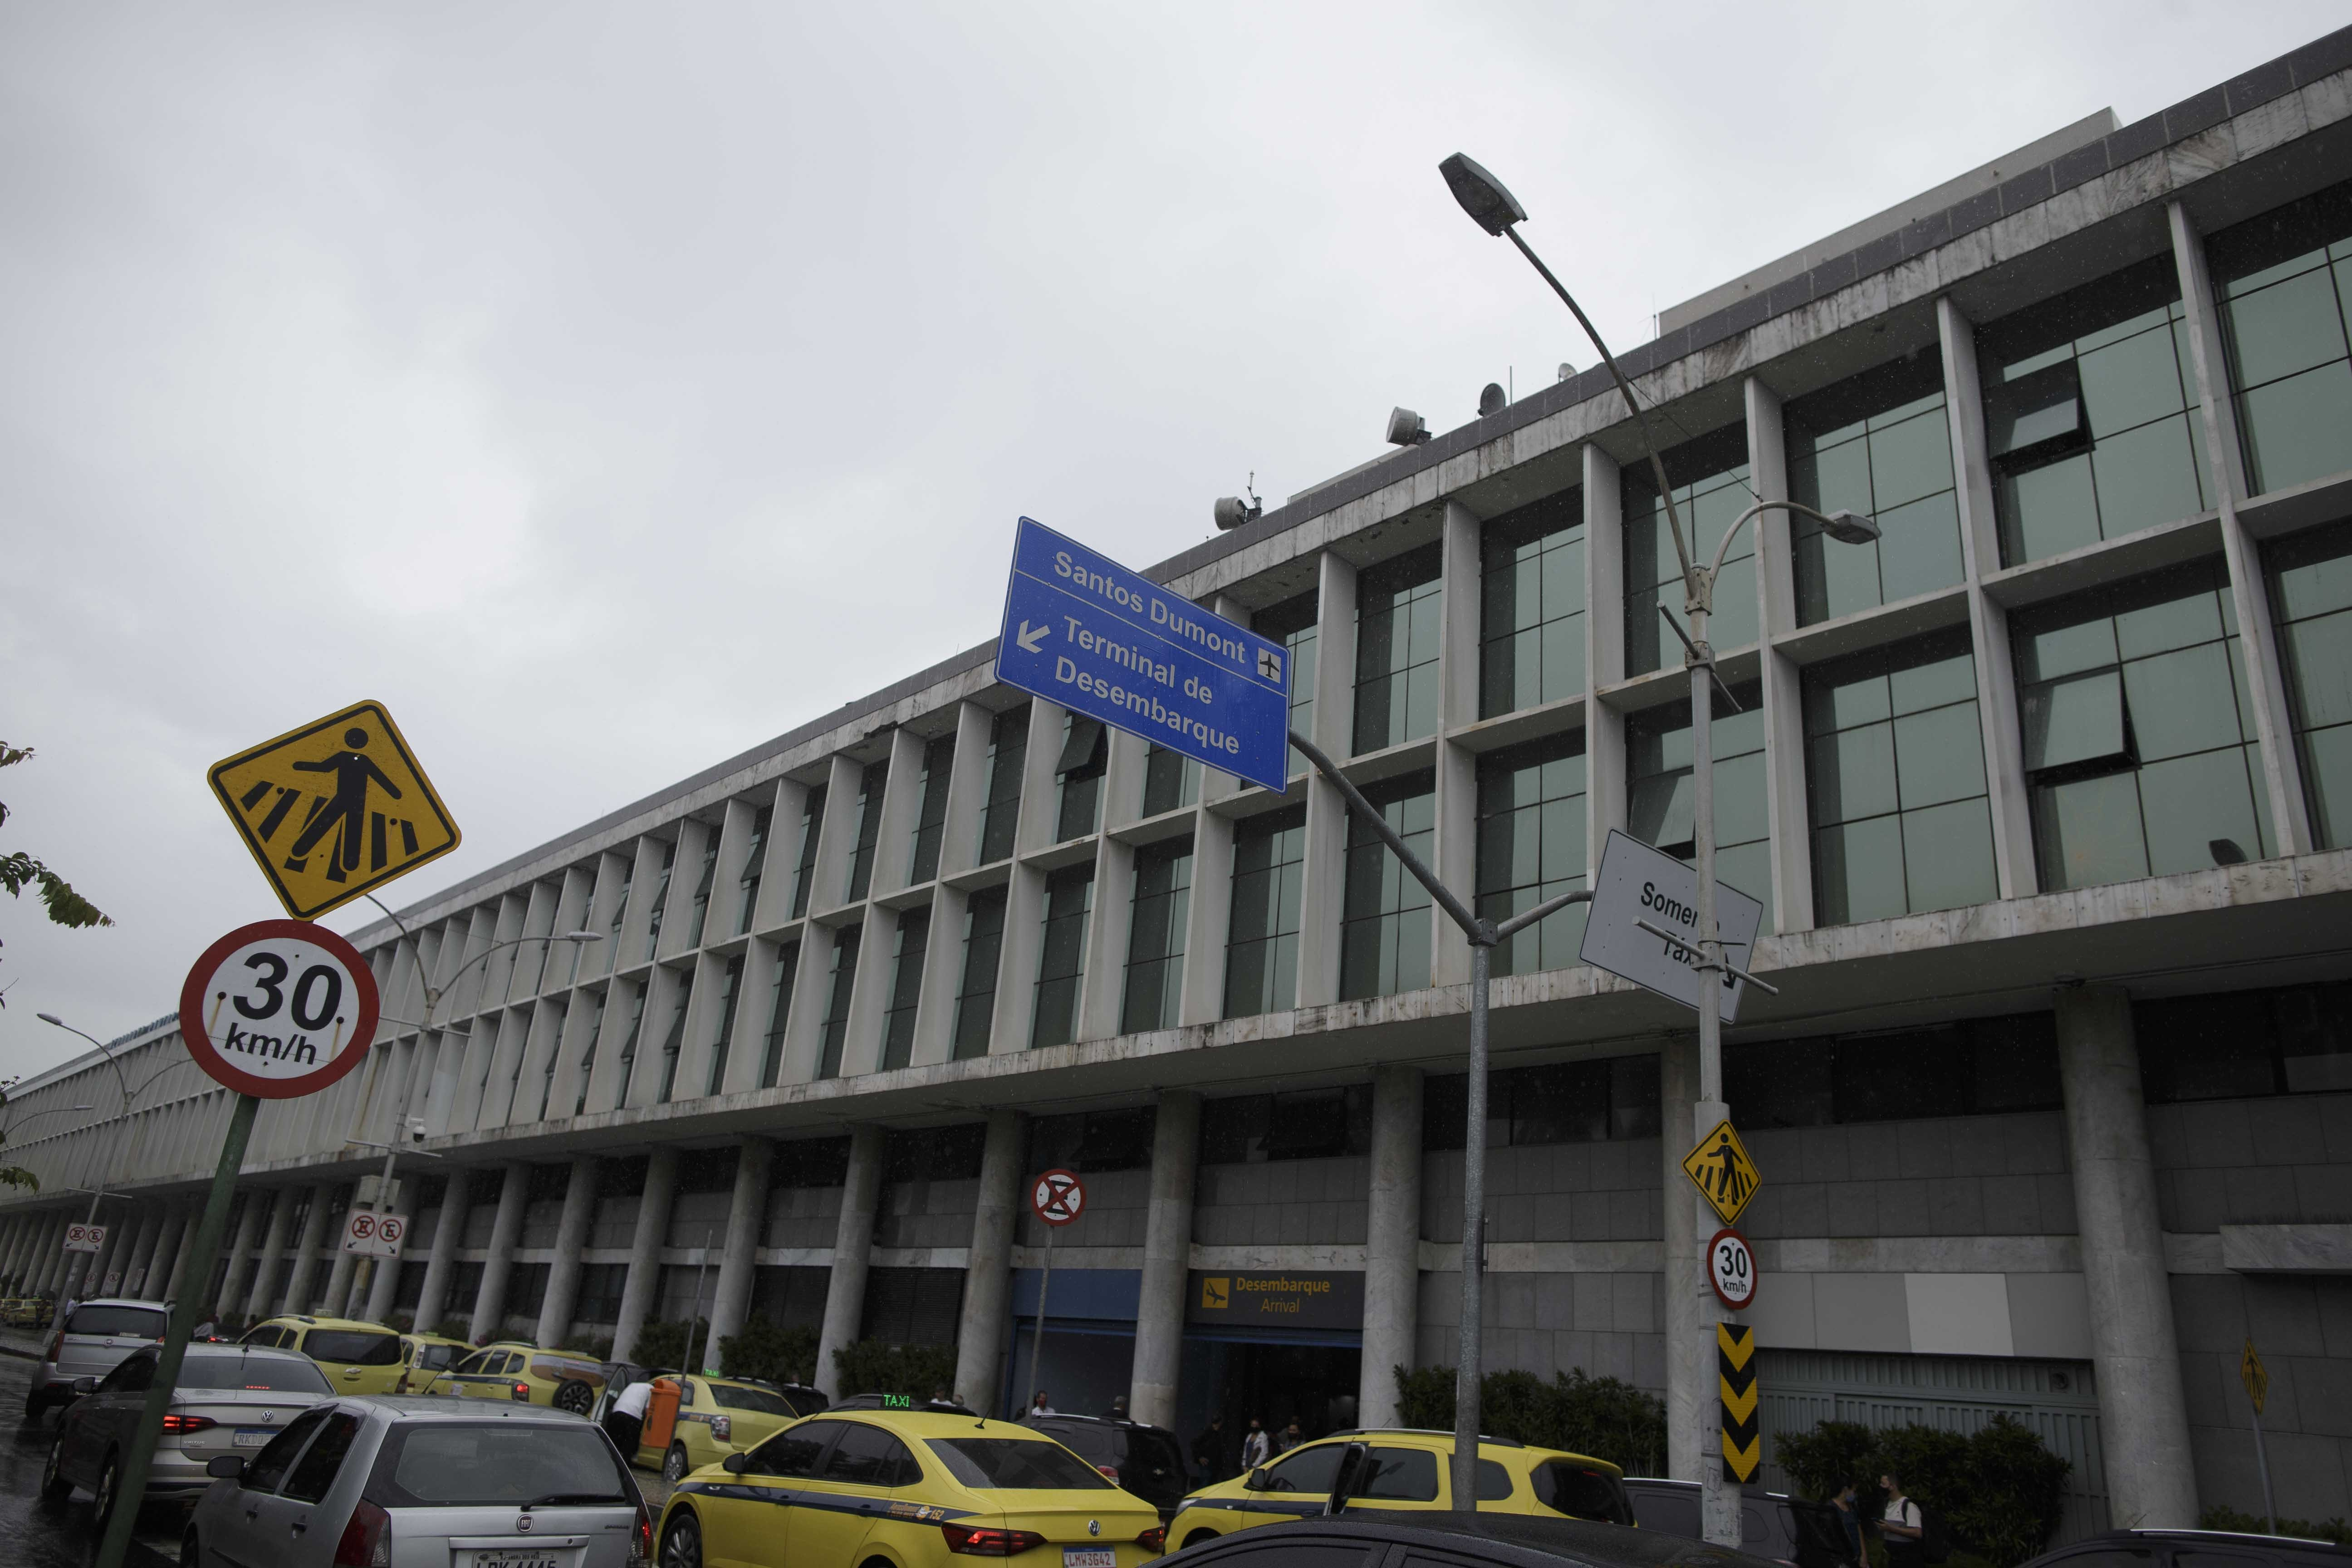 Aeroporto Santos Dumont testa reconhecimento facial na hora do embarque